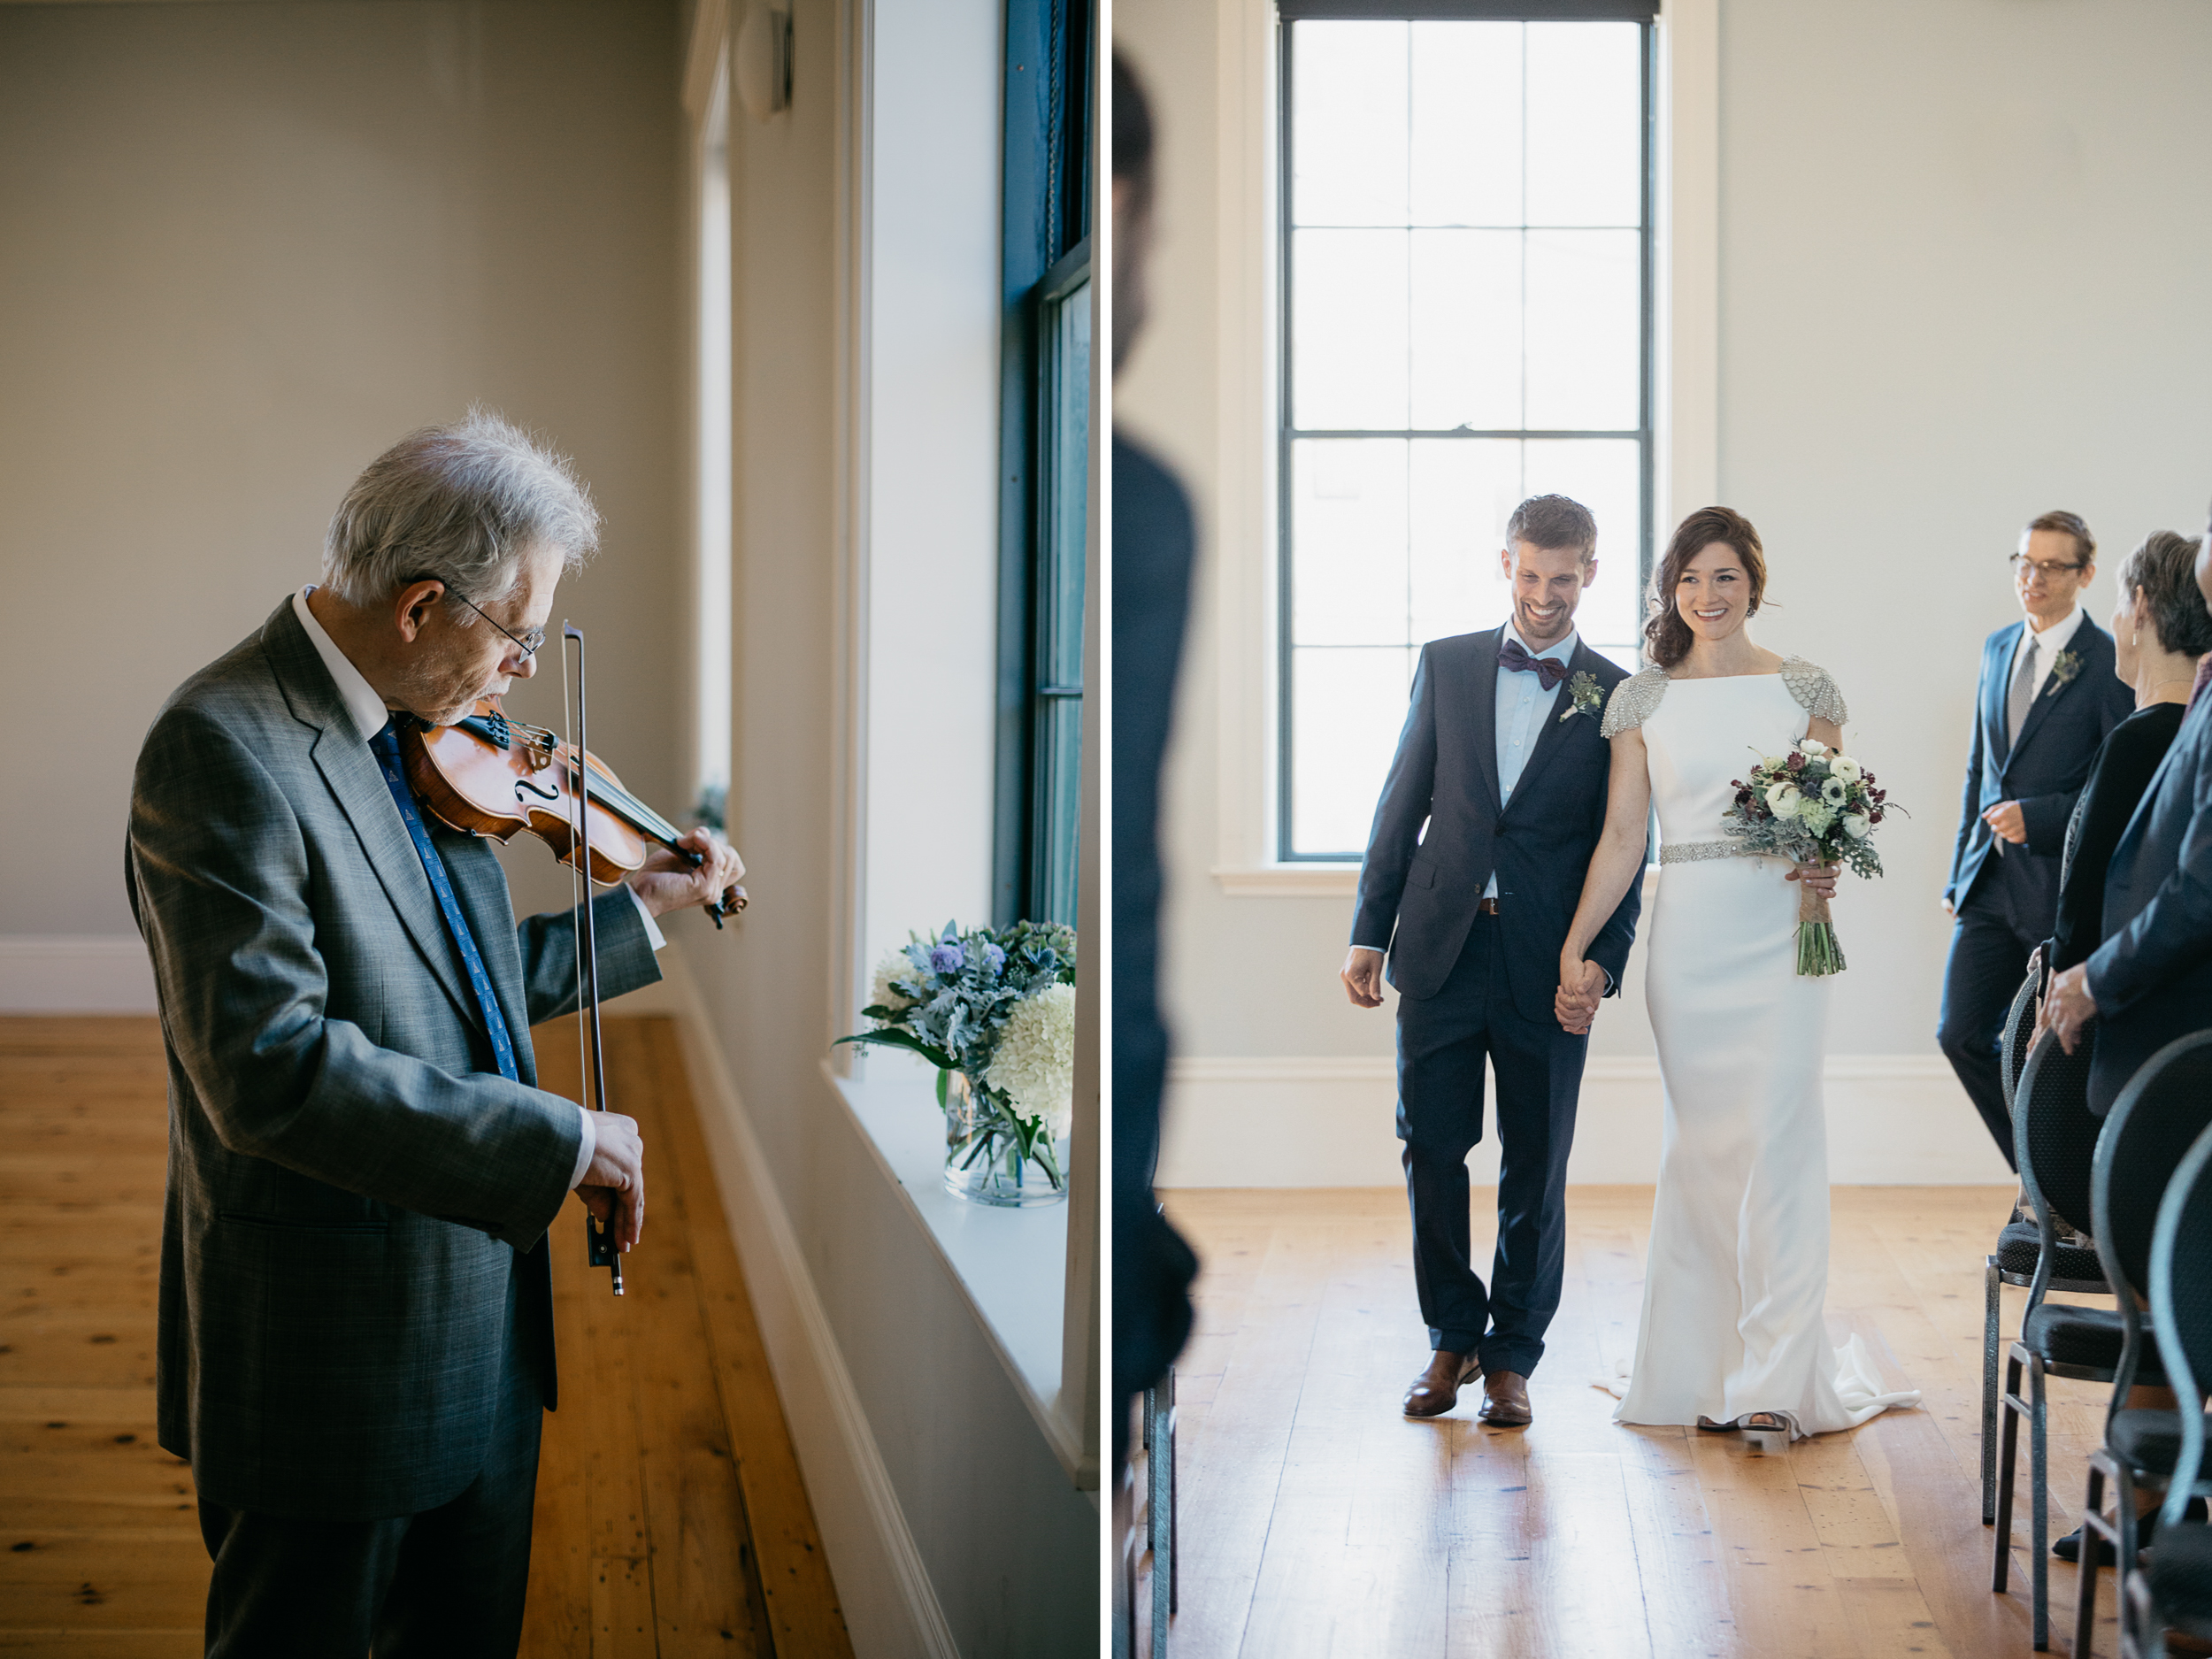 Mackenzie_Collins_Maine_wedding_in_Rockport_Union_hall_Nina_June_009.jpg